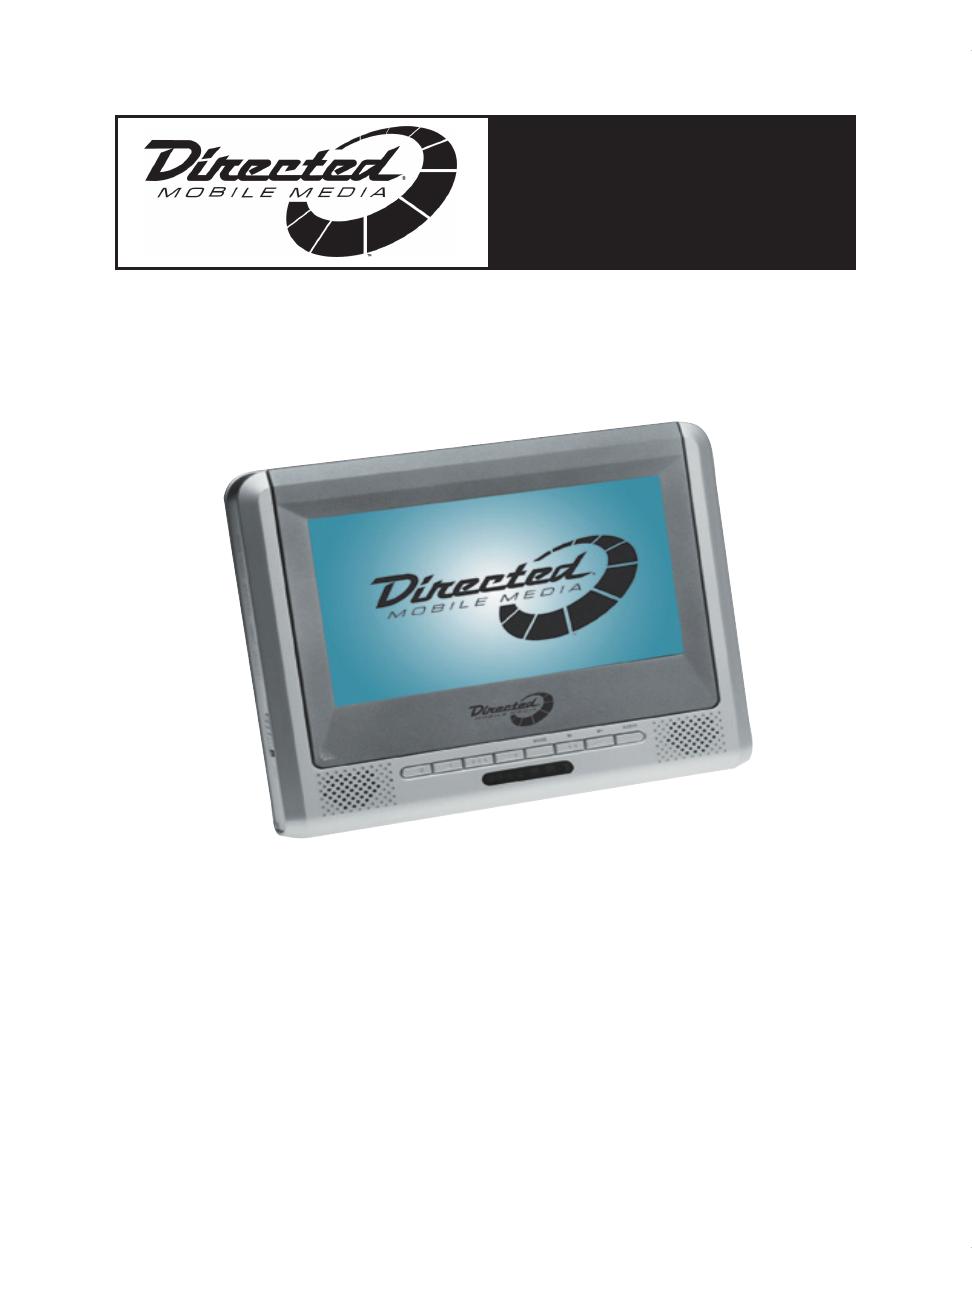 background image. TD700. OWNER'S GUIDE